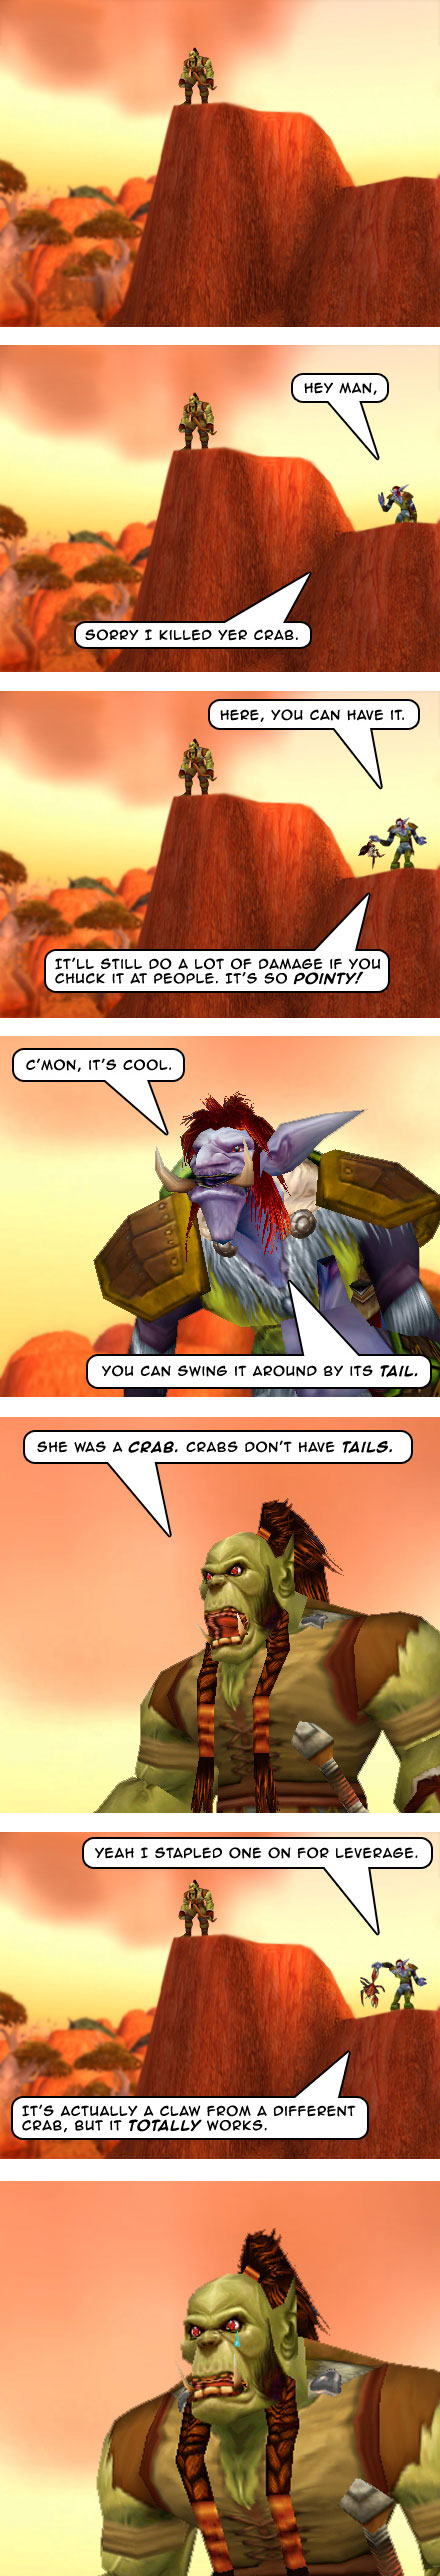 Part 2: Troll Apologies